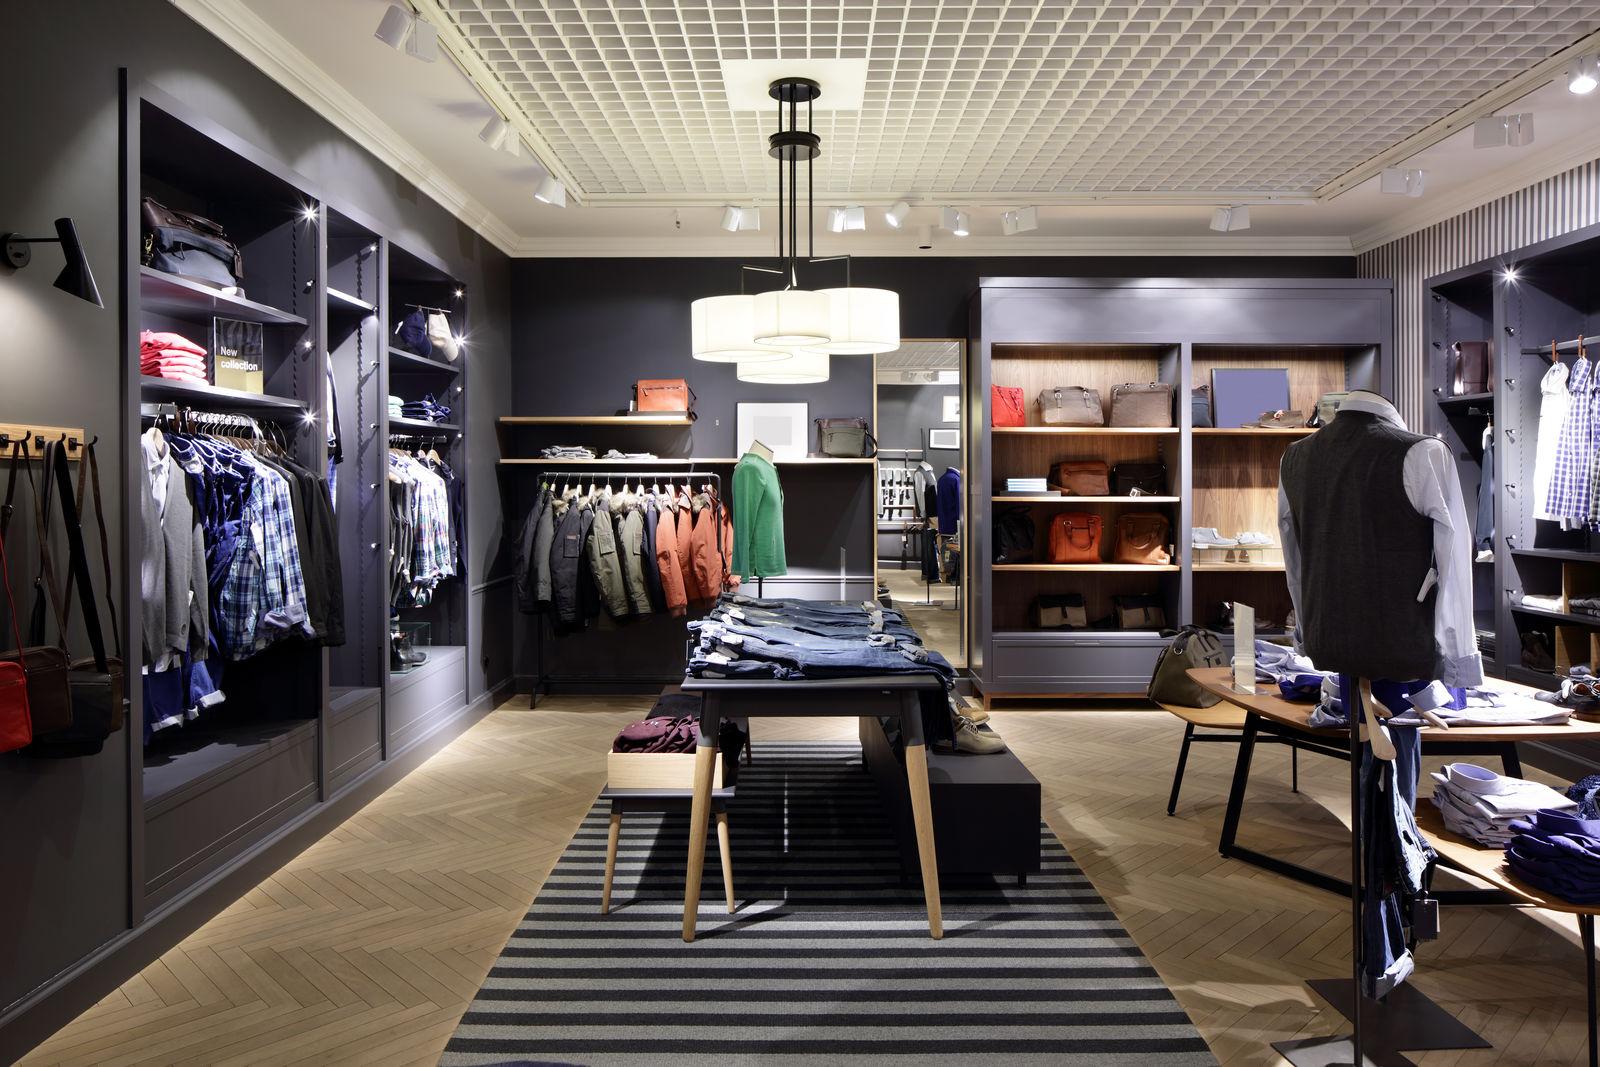 Sample Shop in Berlin (Bild 1)